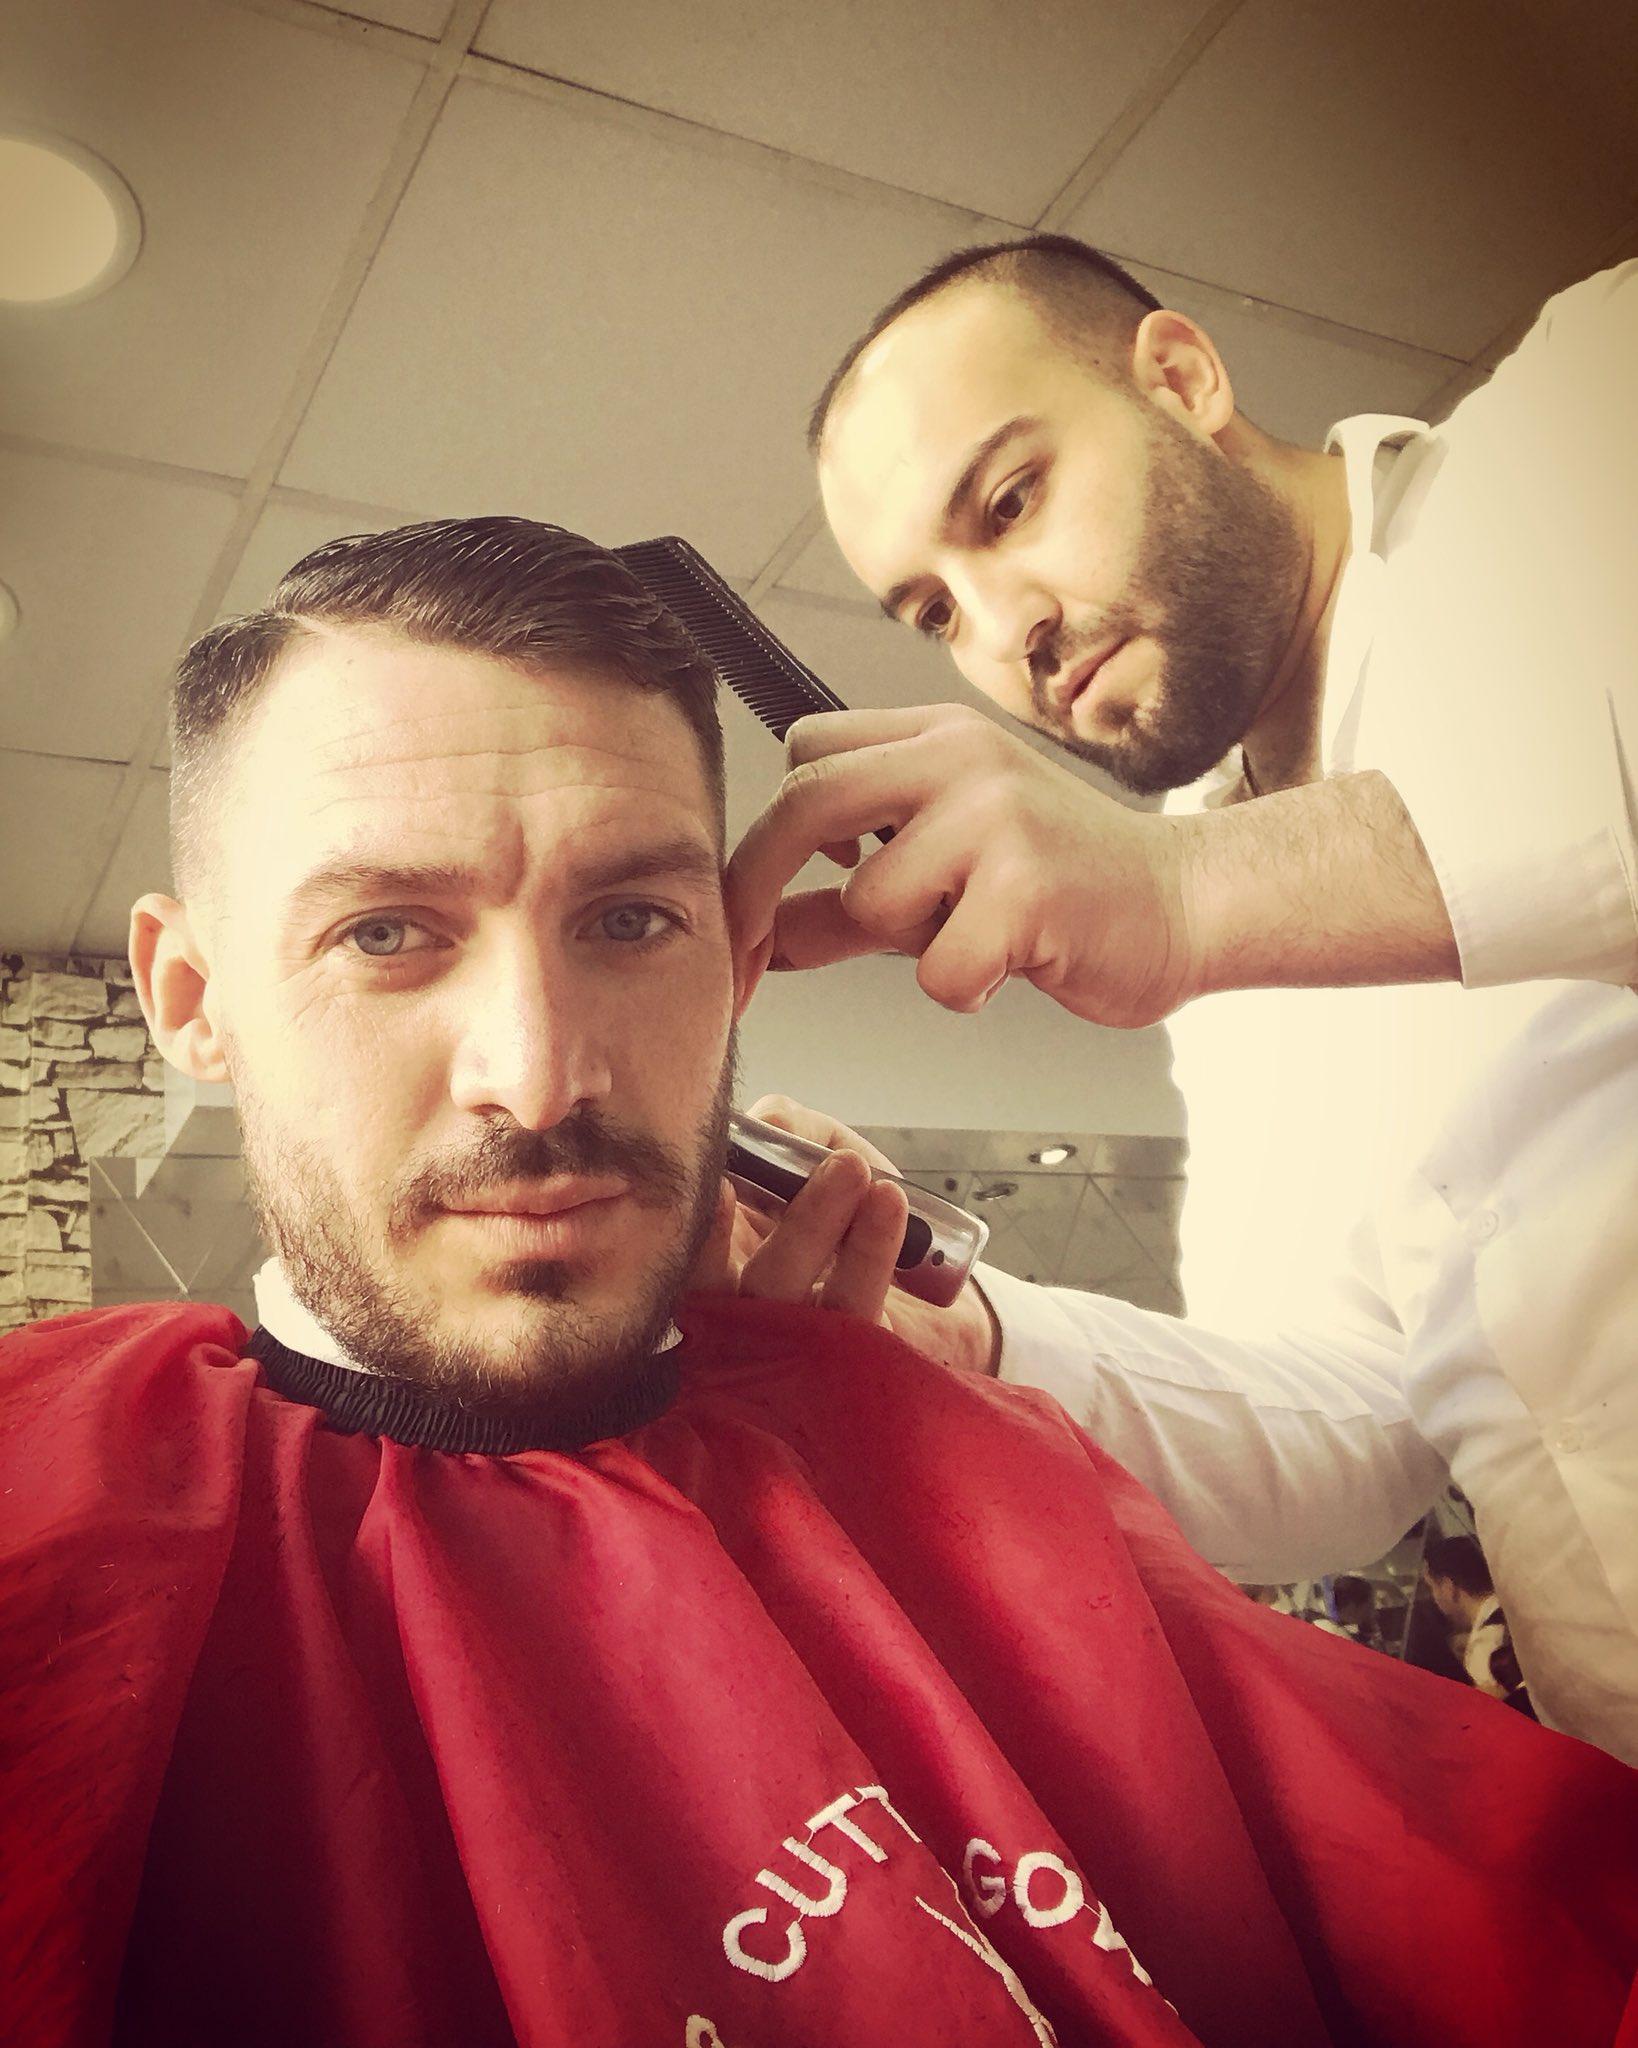 Fresh trim #skbarbers https://t.co/O4ugirkOYj